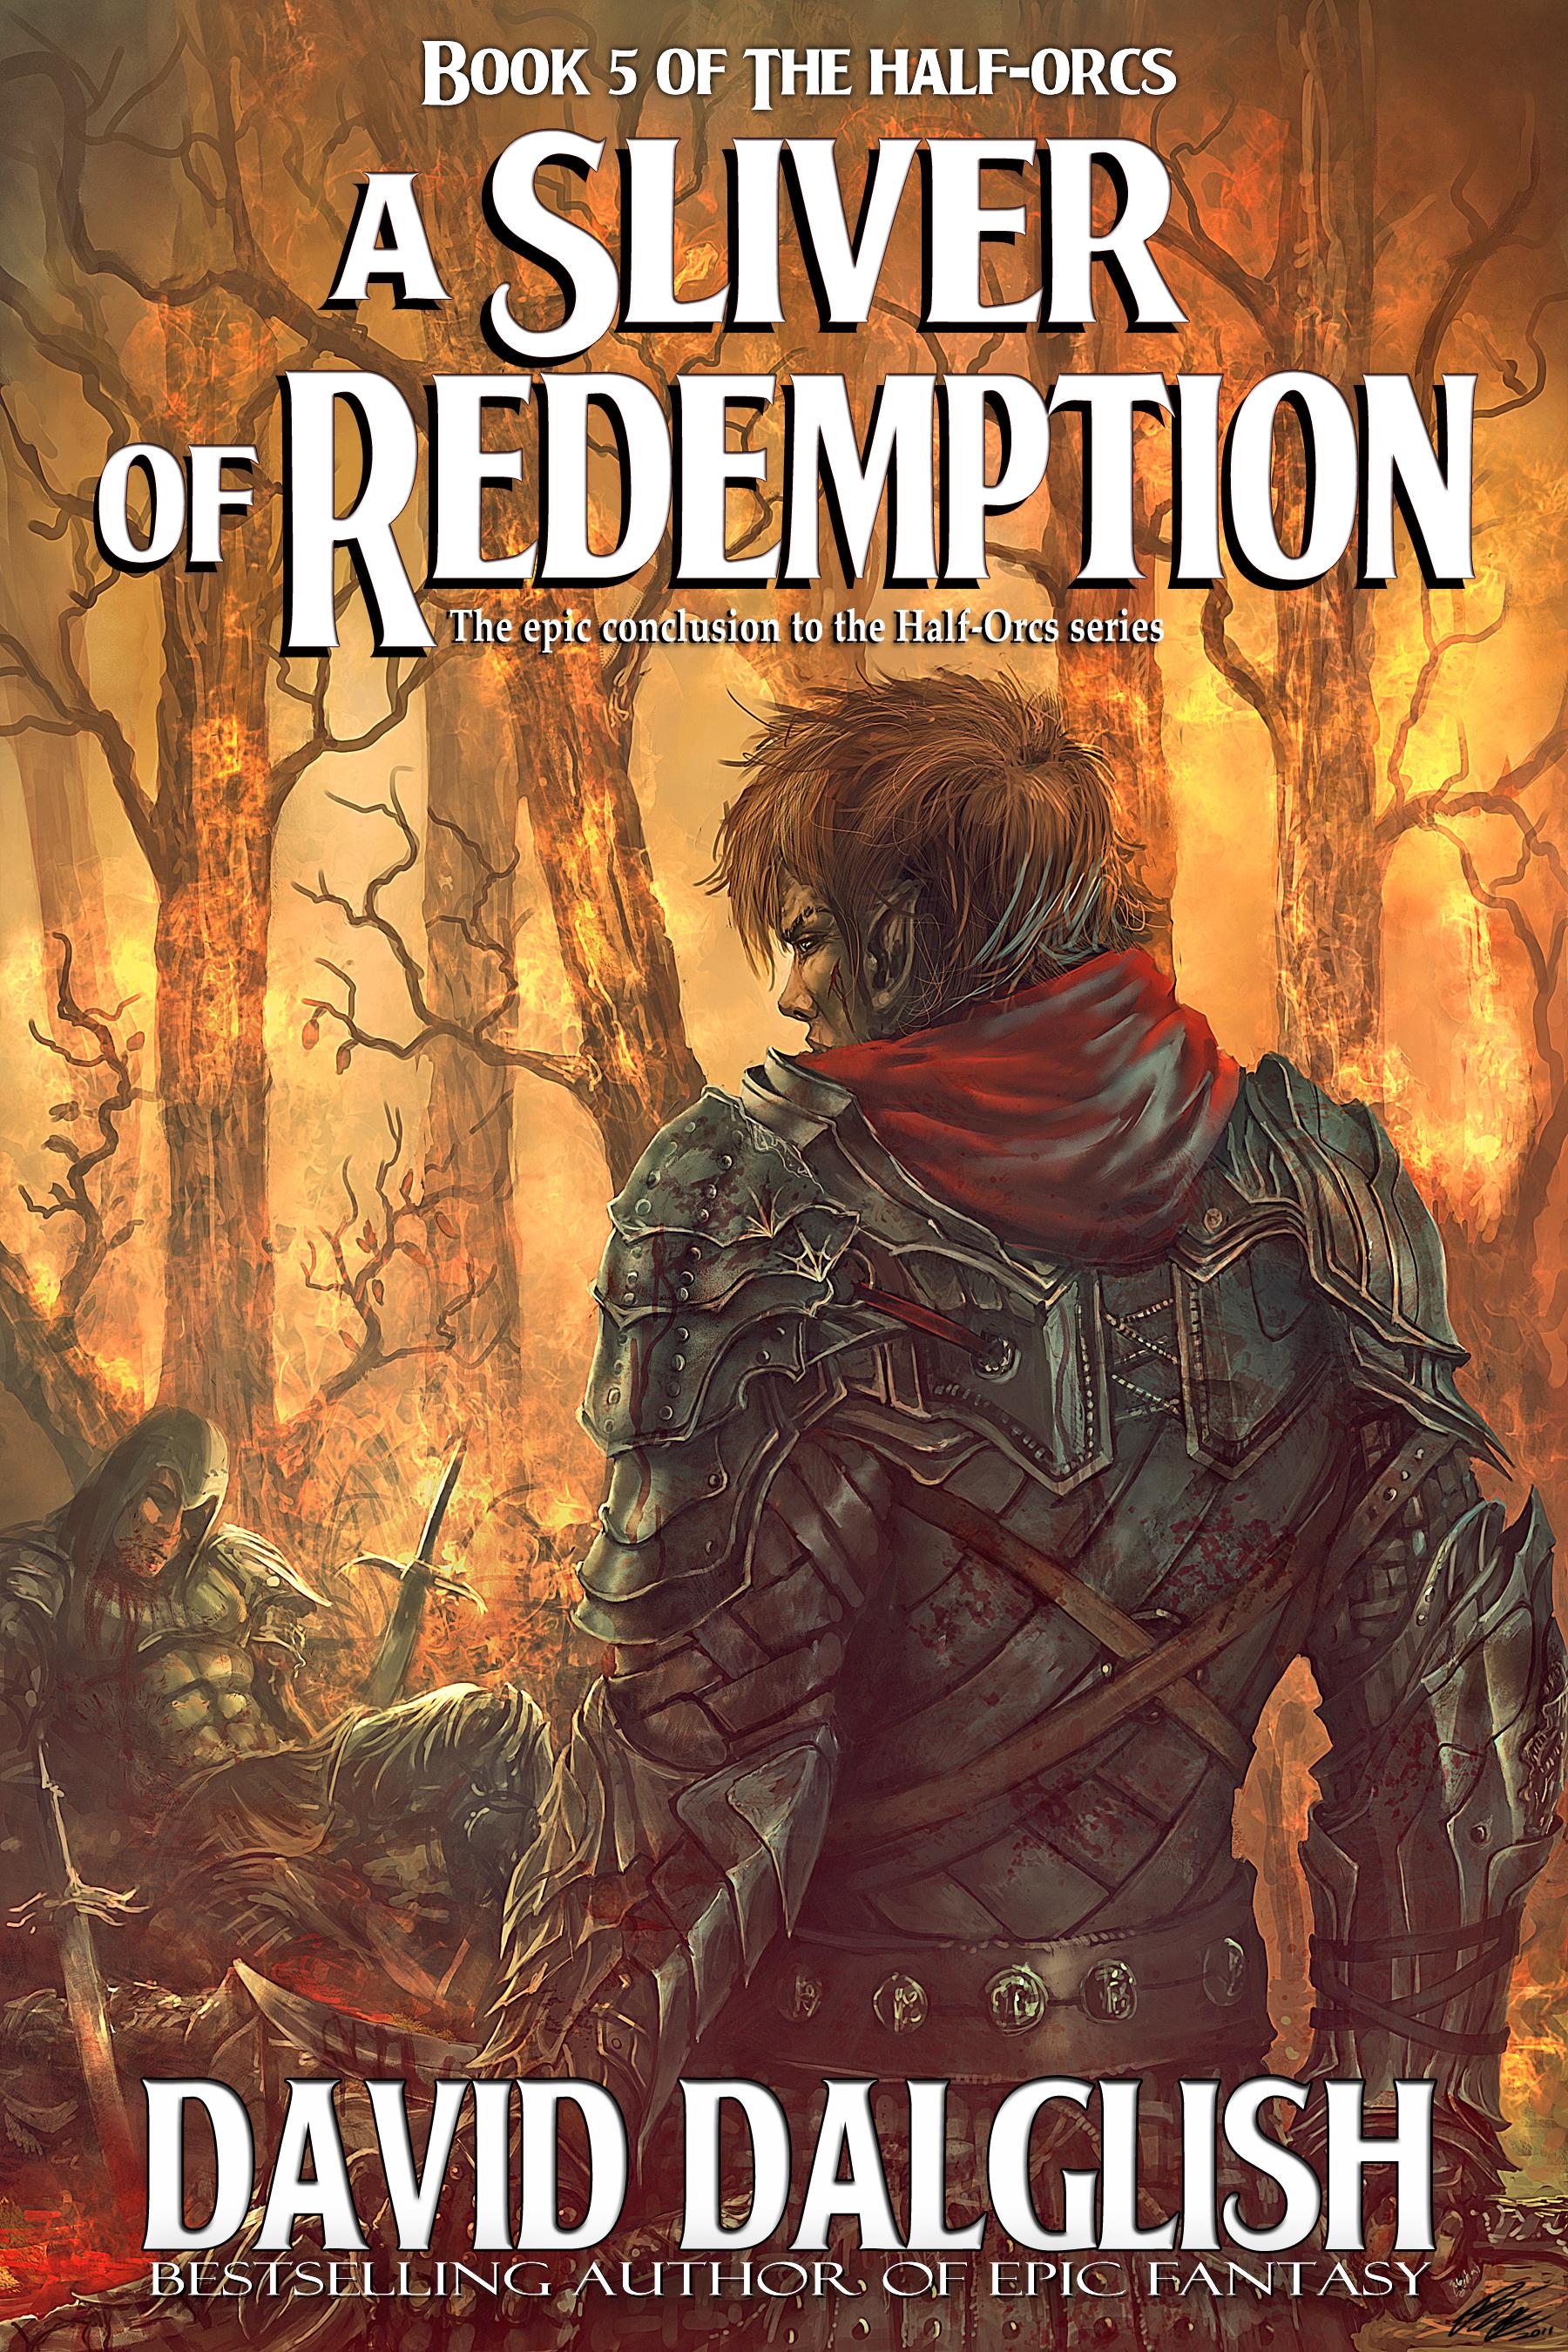 Cover, Book 5